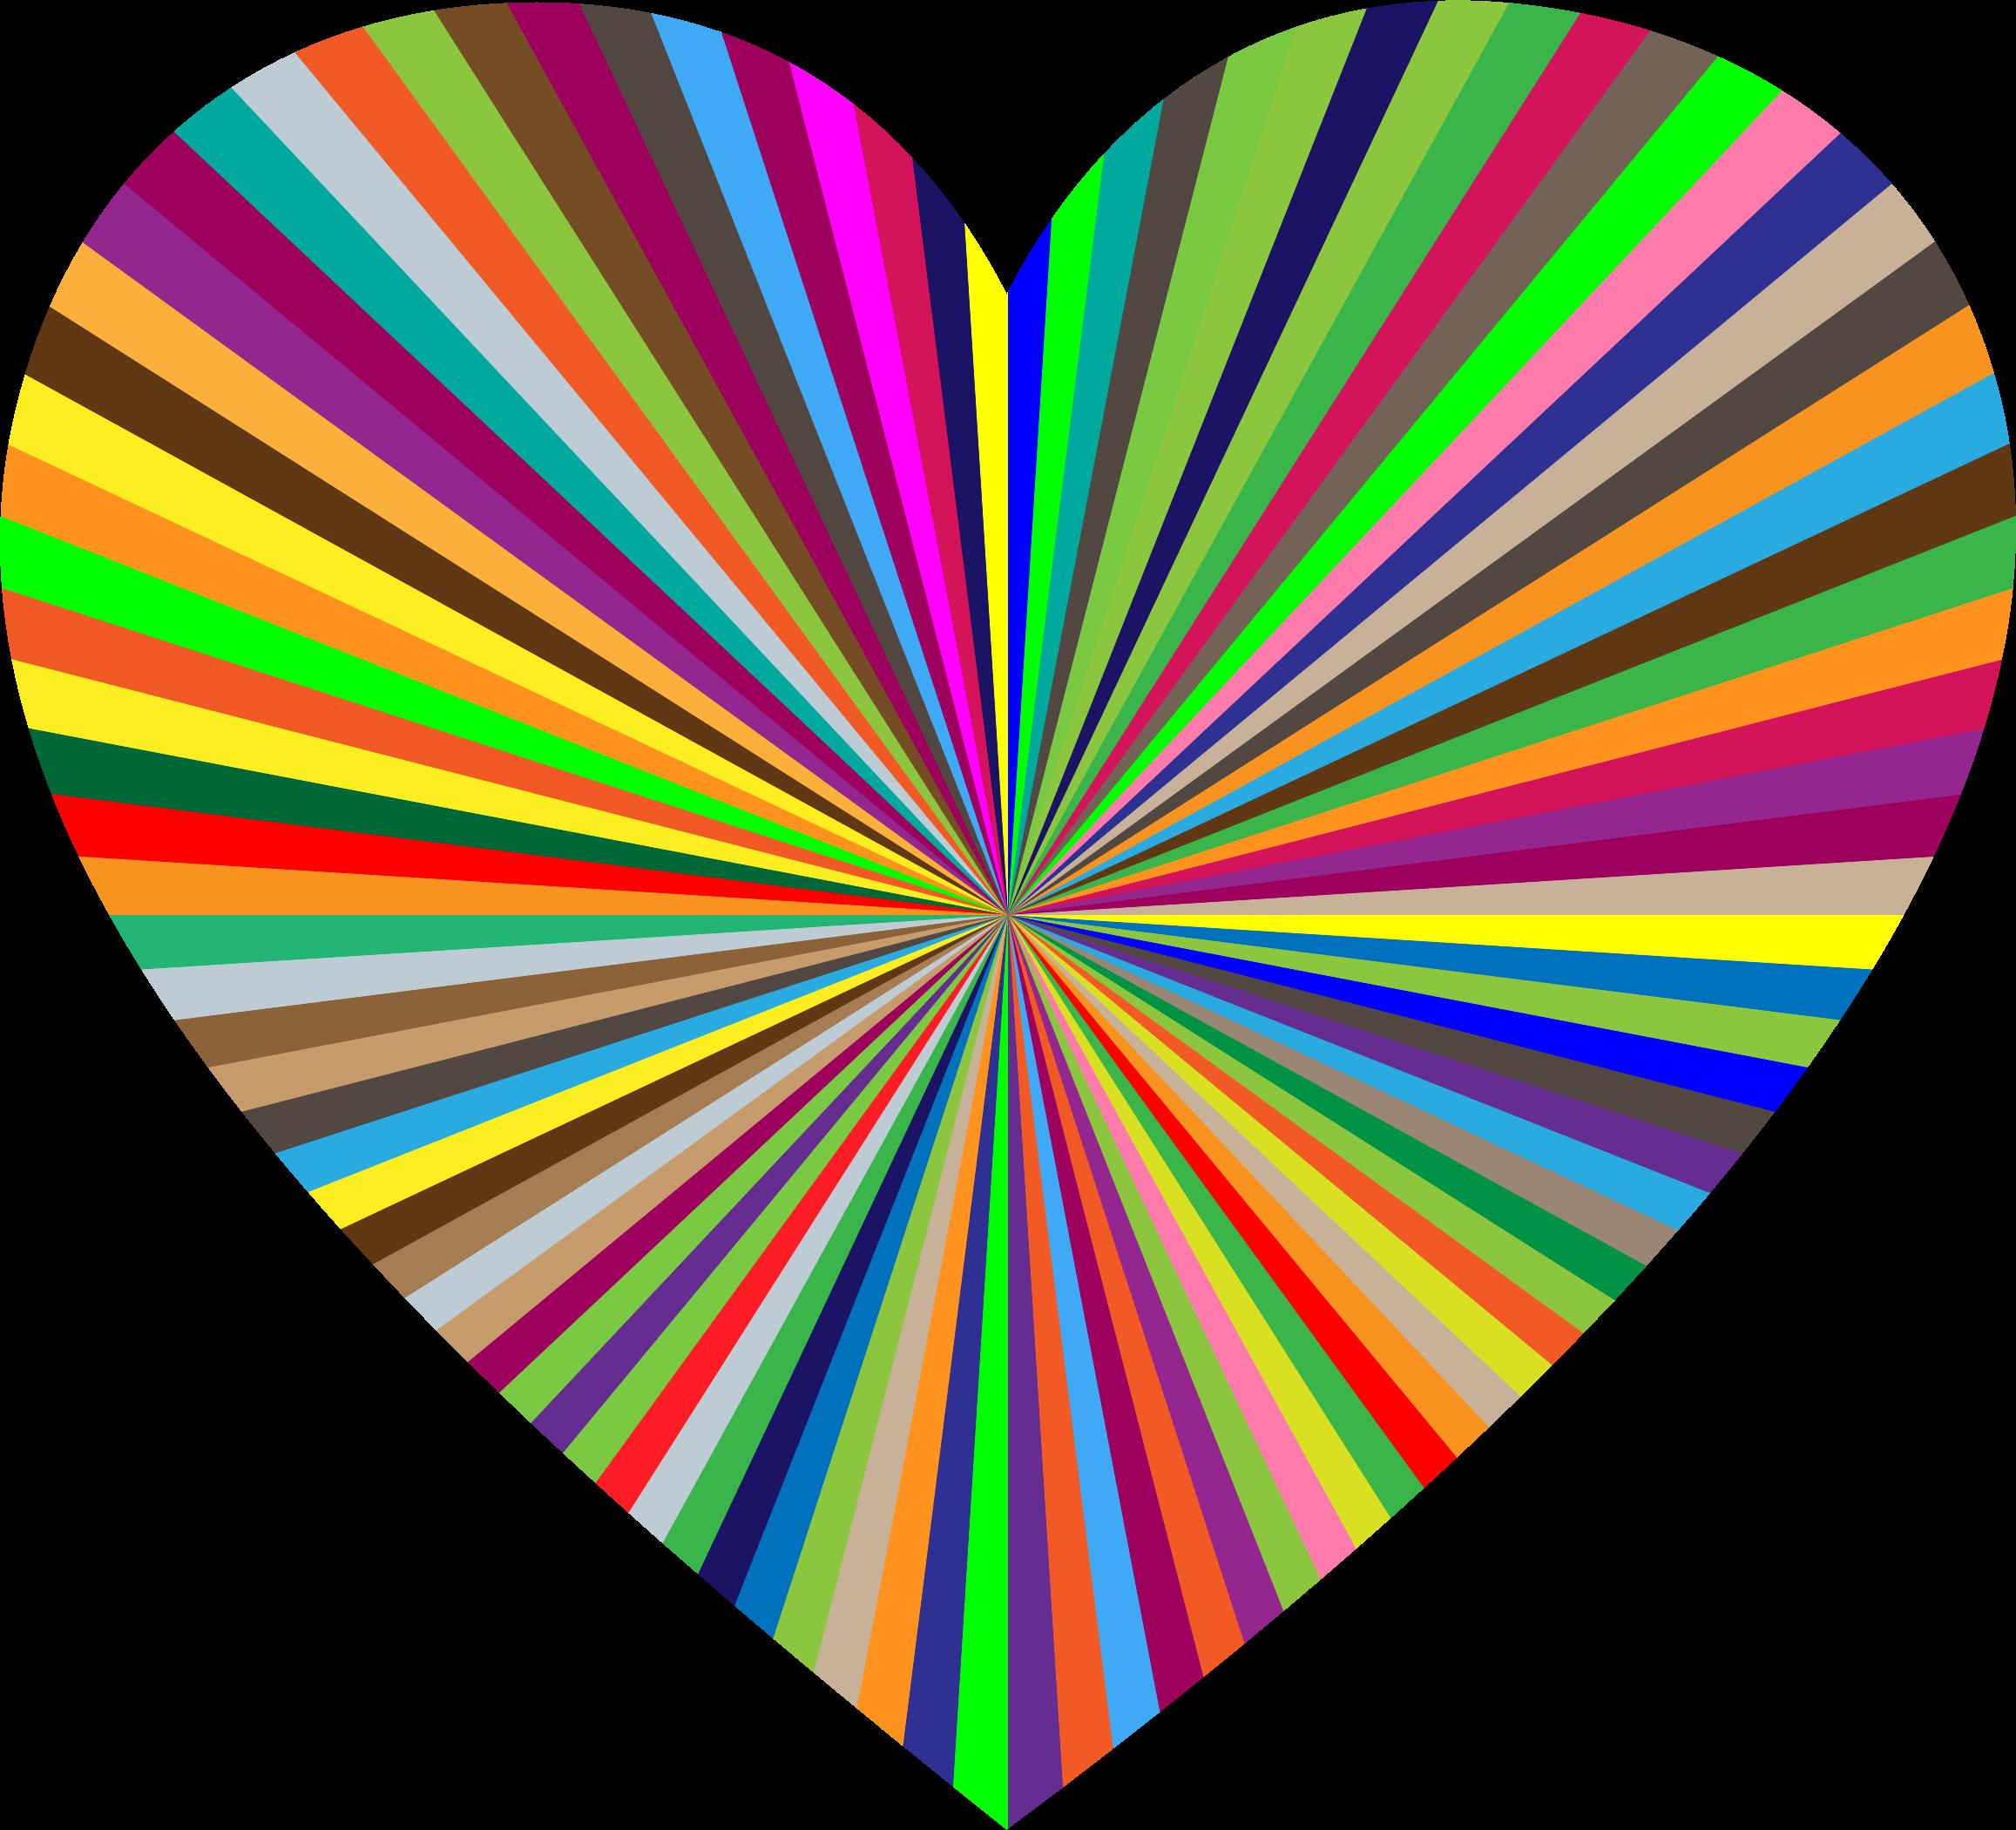 clipart starburst heart 18 love heart clipart gif love heart clipart black and white